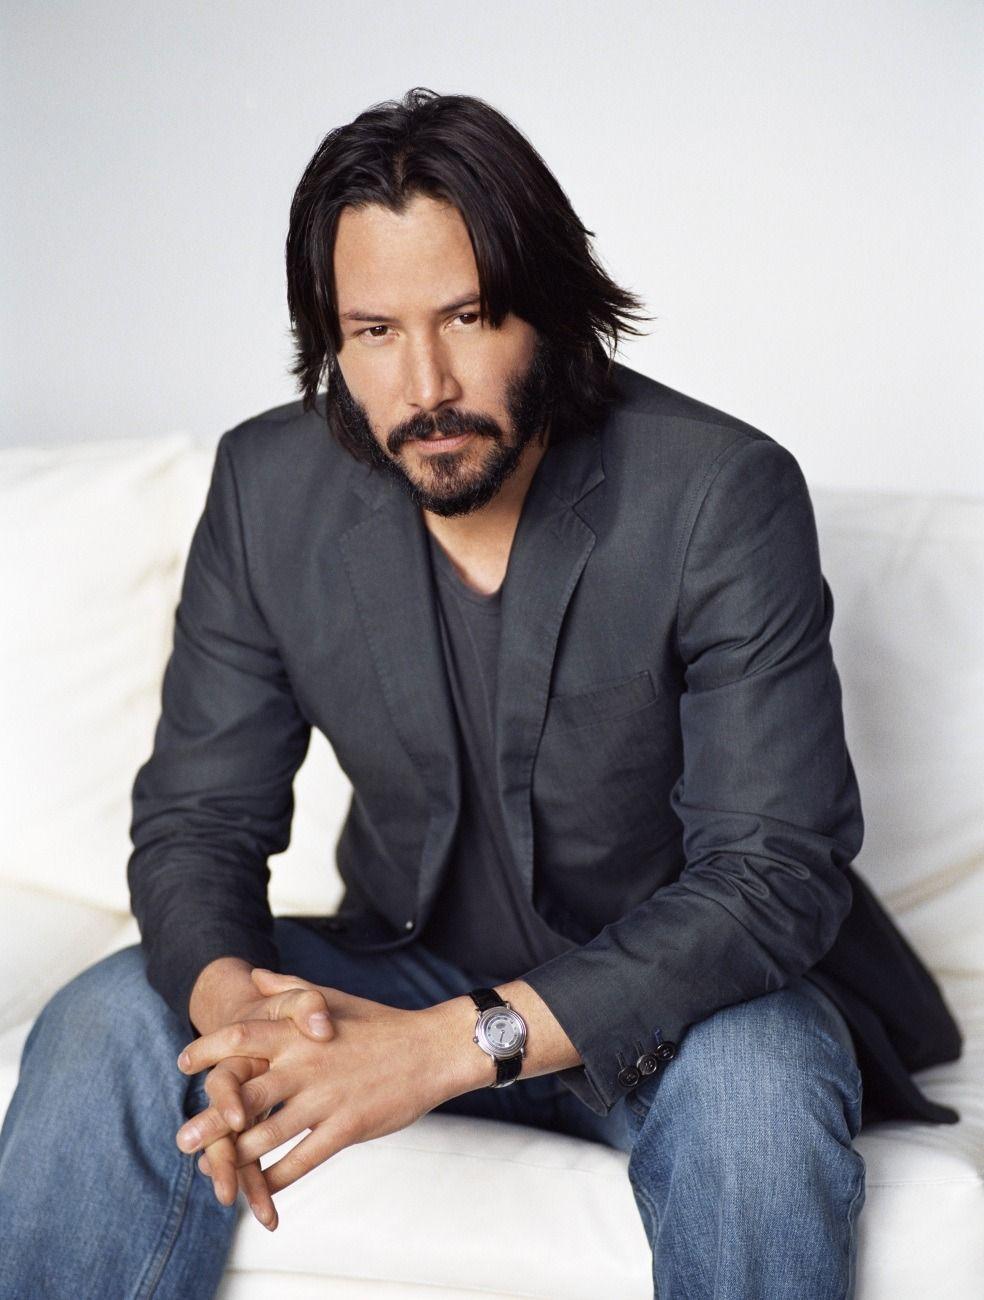 Keanu Reeves elegant classic beard style